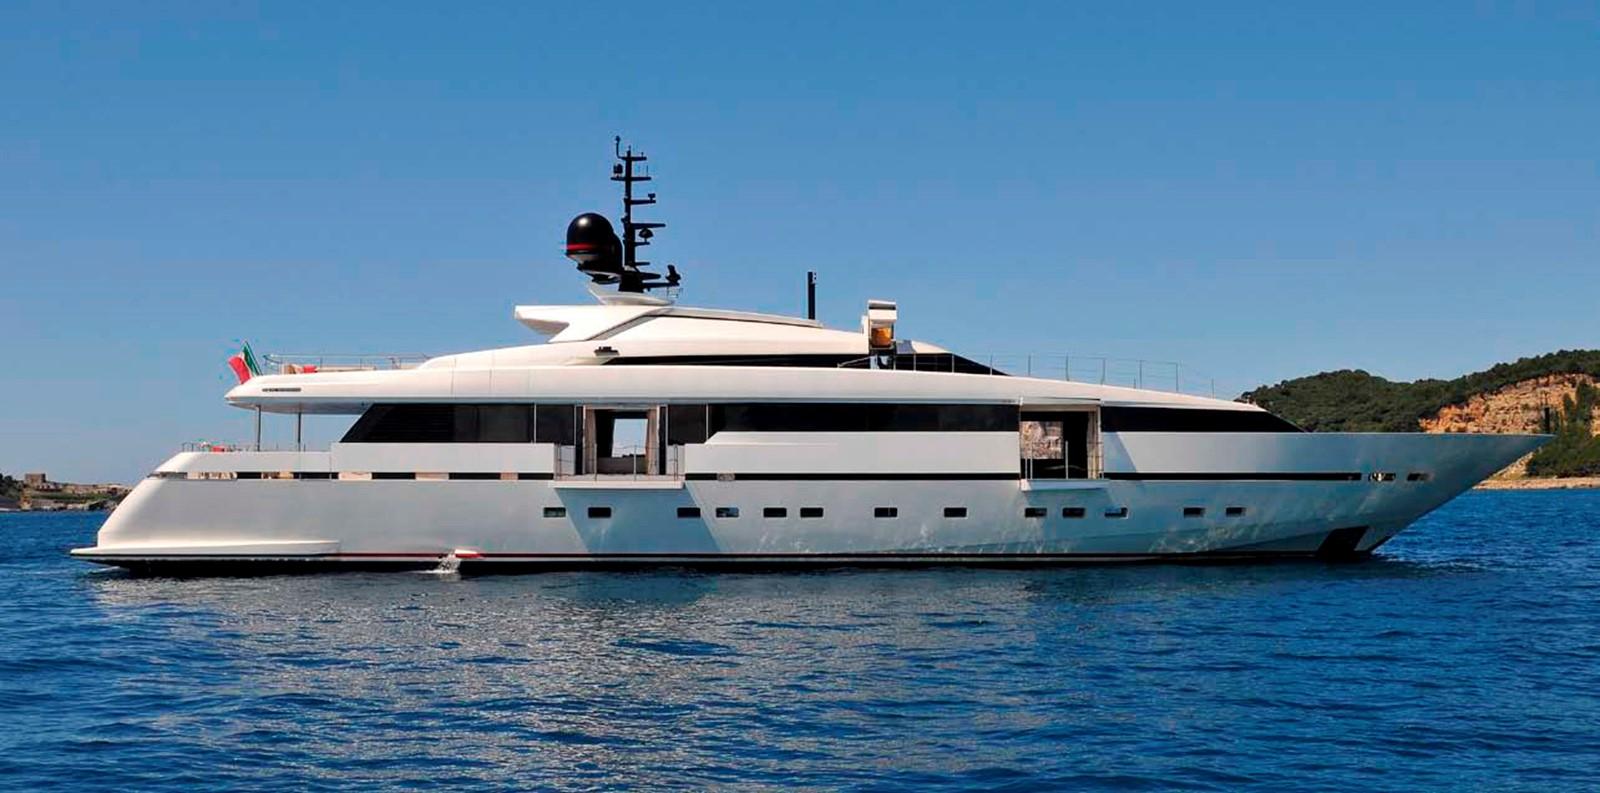 2013 SANLORENZO 40ALLOY Motor Yacht 1356920